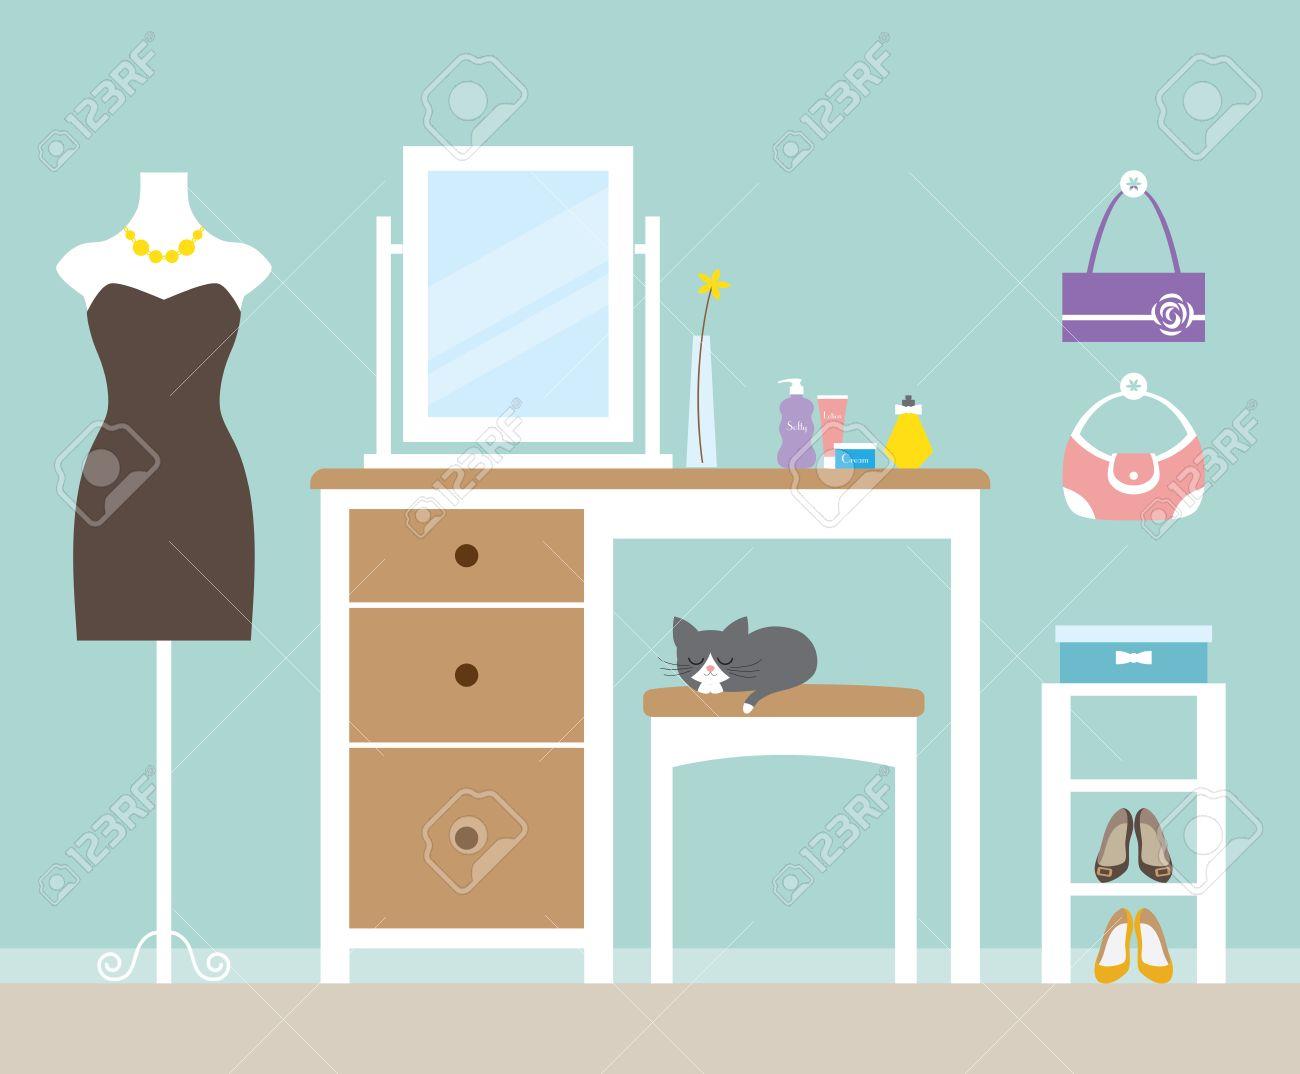 Vector illustration of a dressing room.